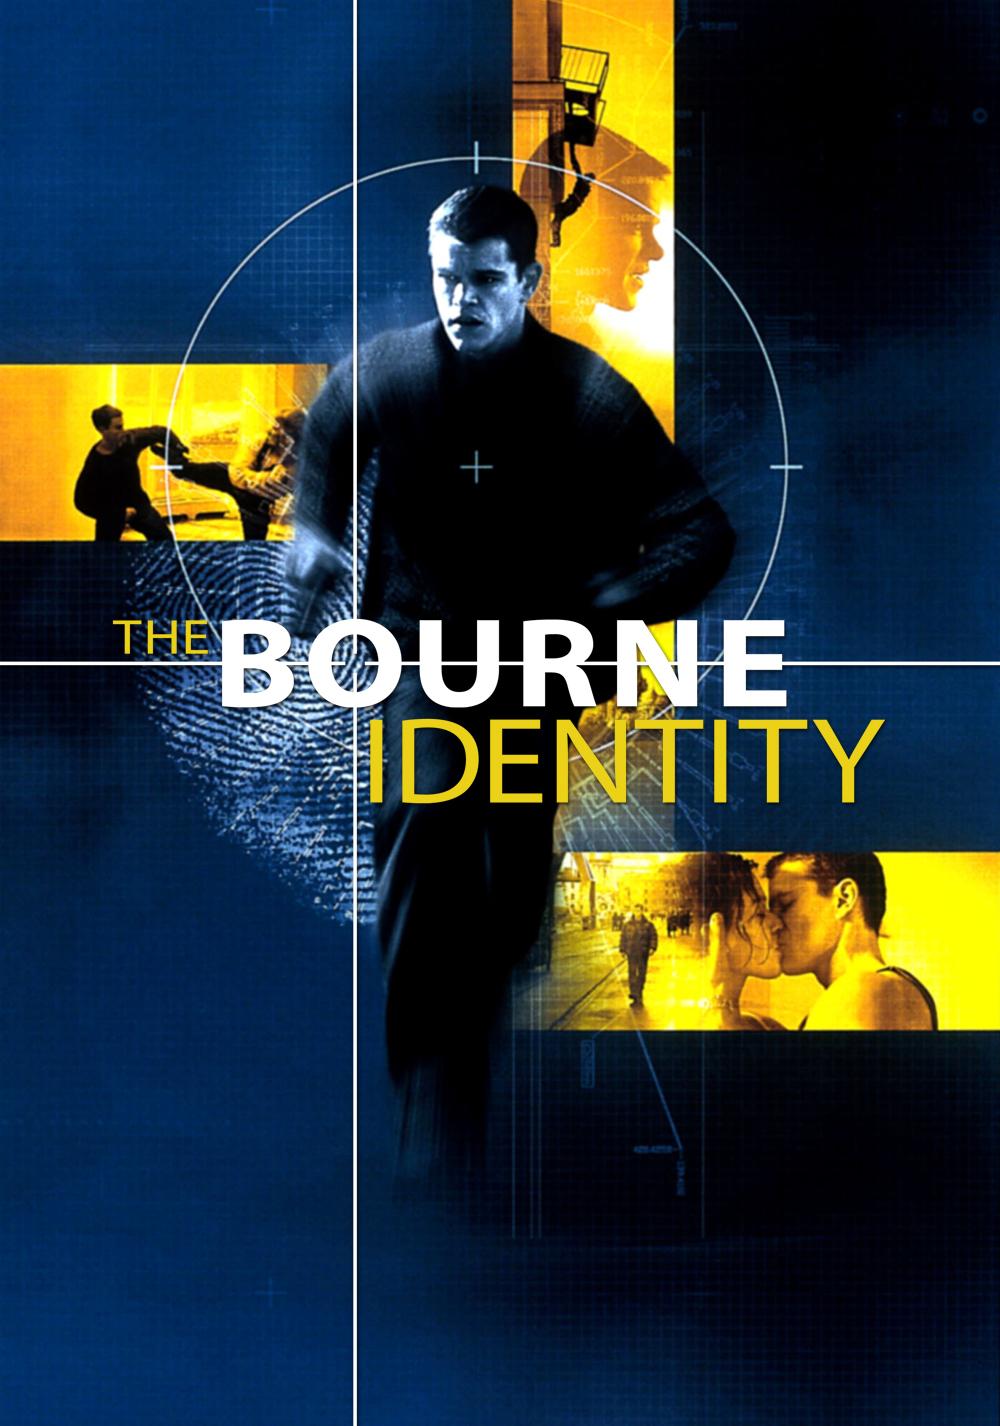 Bourne movie poster